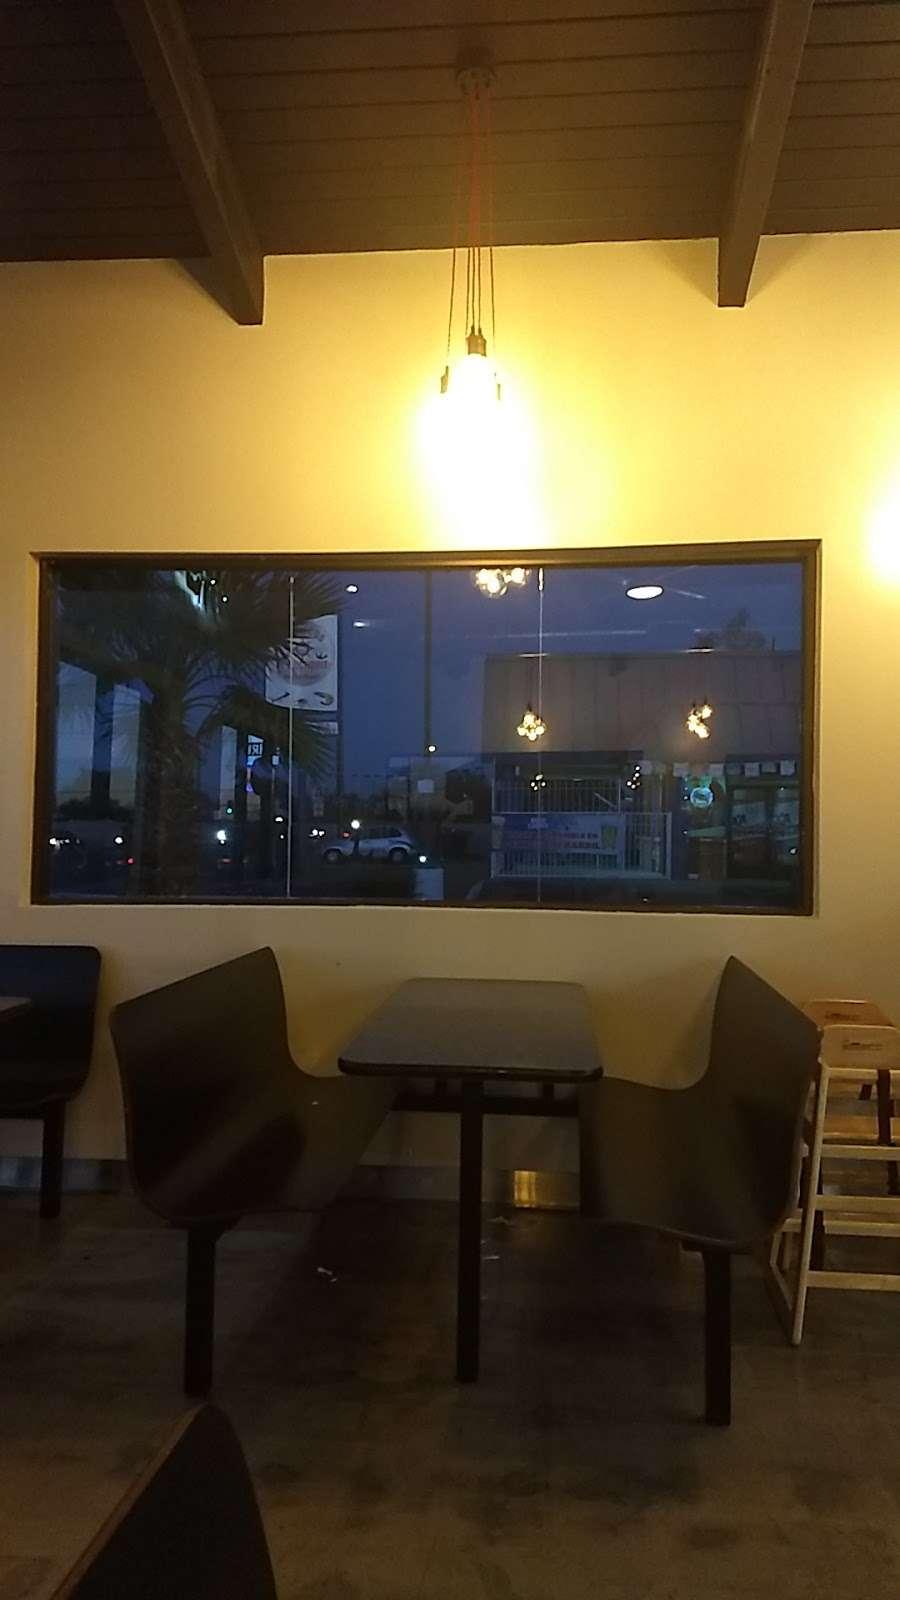 Pirates Fish & Chips - restaurant  | Photo 6 of 10 | Address: 5041 W Thomas Rd, Phoenix, AZ 85031, USA | Phone: (602) 578-0299